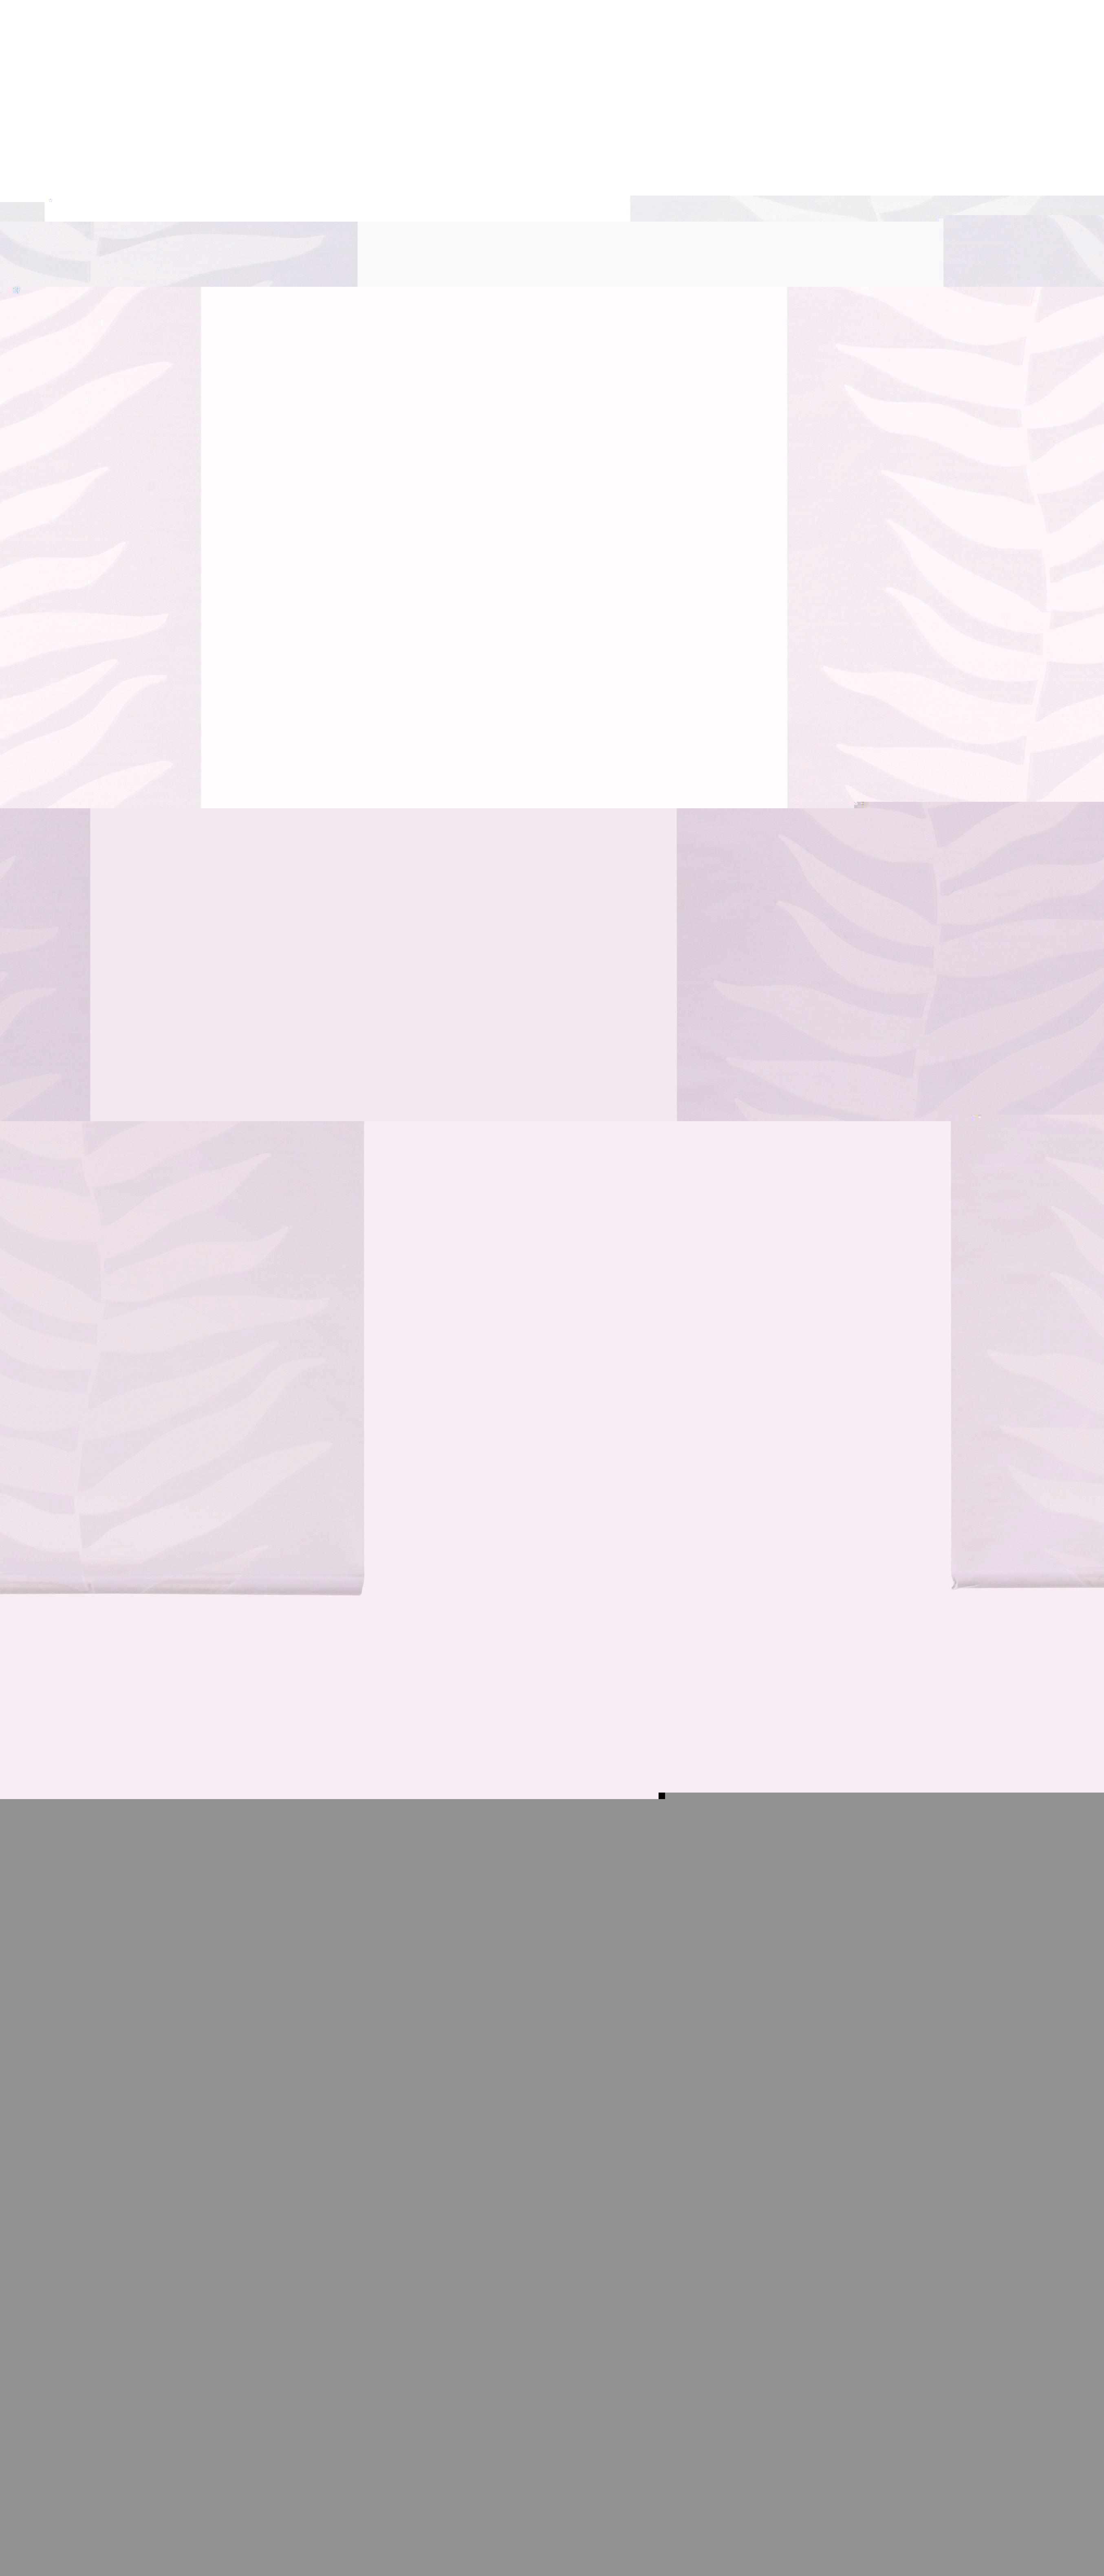 Flächenvorhang Joe in Weiß, ca. 60x245cm - Weiß, MODERN, Textil (60/245cm) - MÖMAX modern living